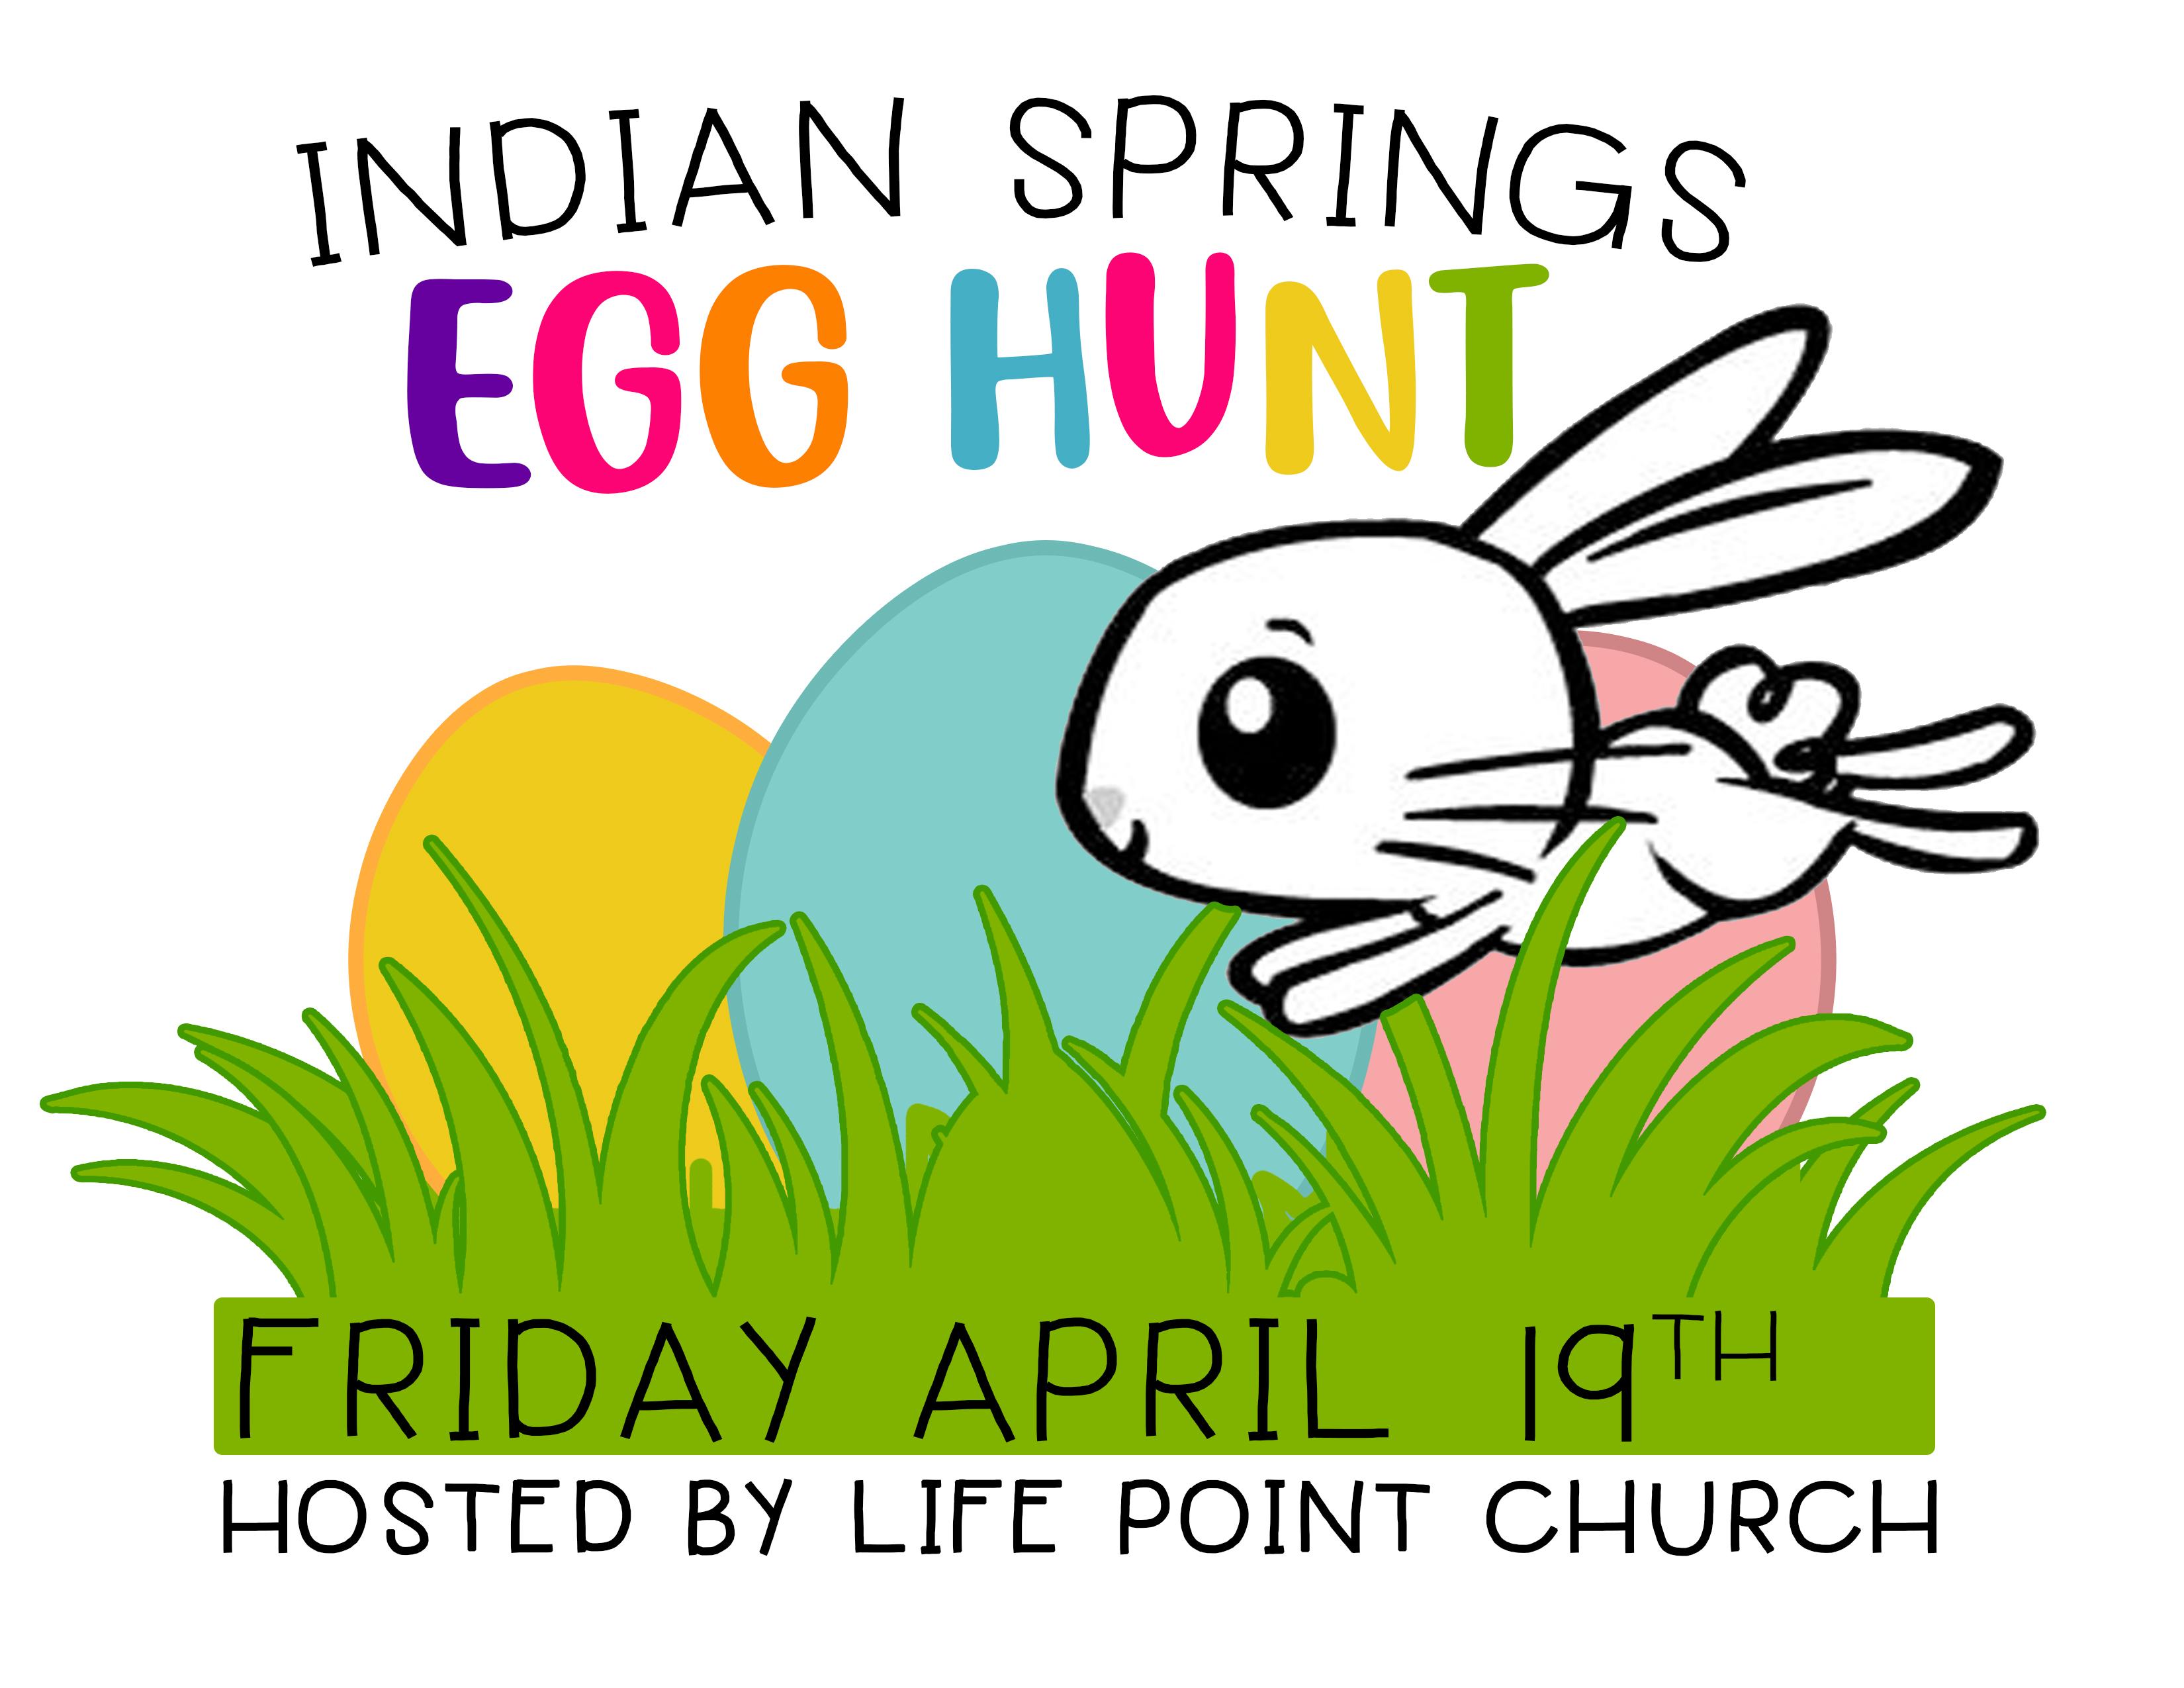 3300x2550 Indian Springs Community Easter Egg Hunt